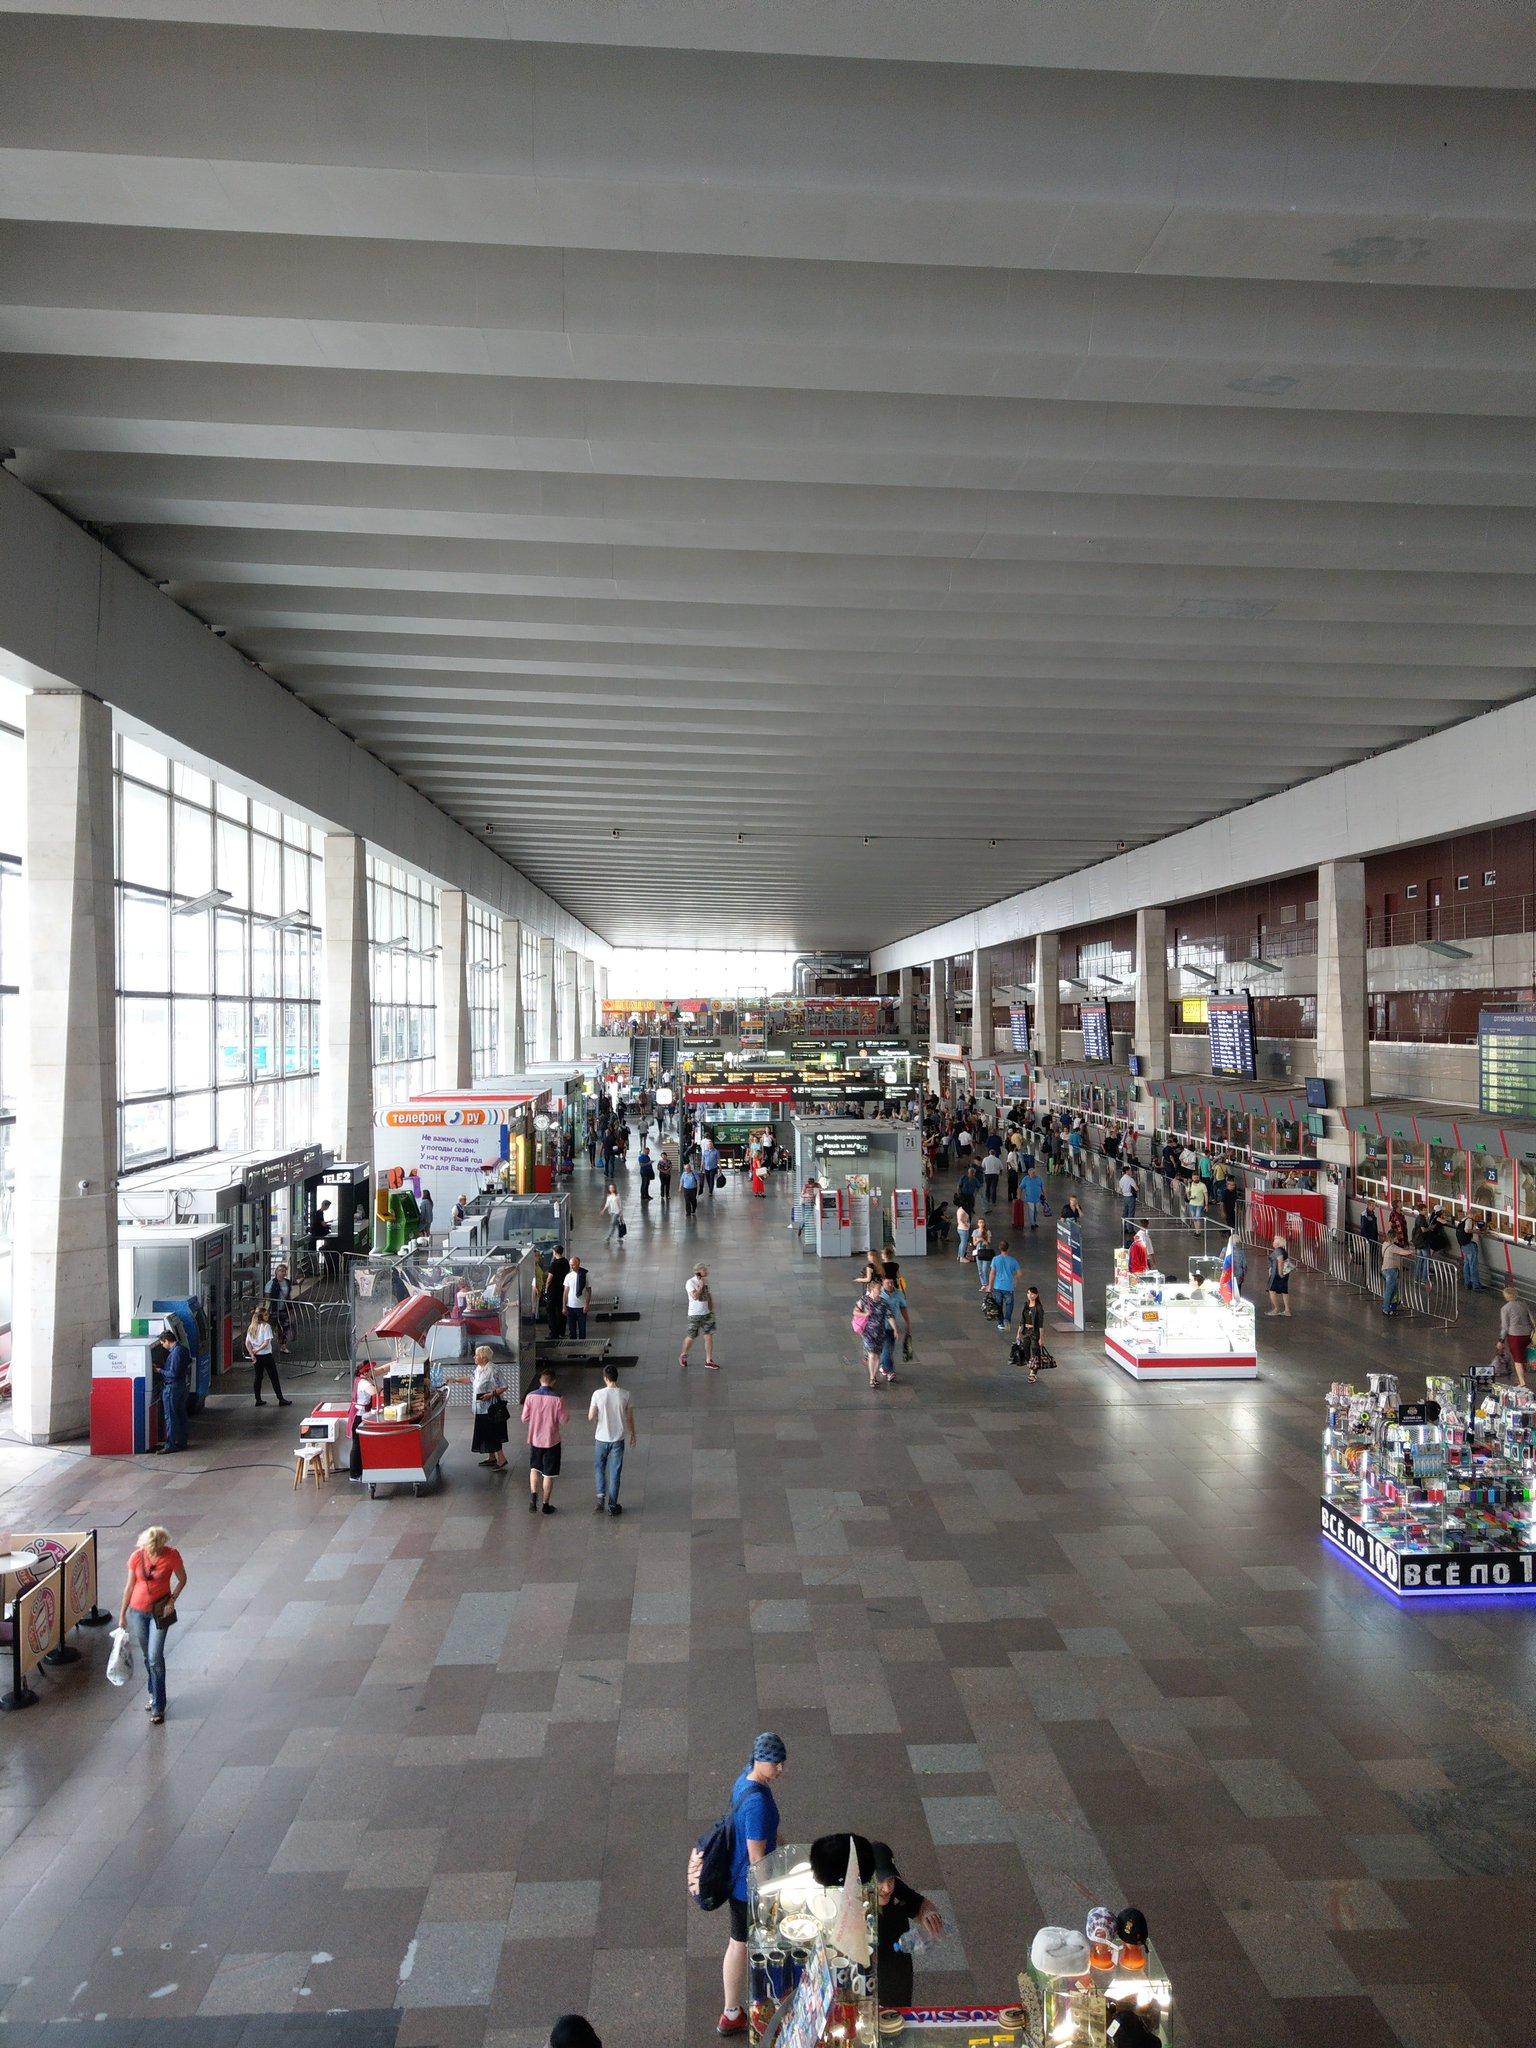 Панорамное фото курского вокзала